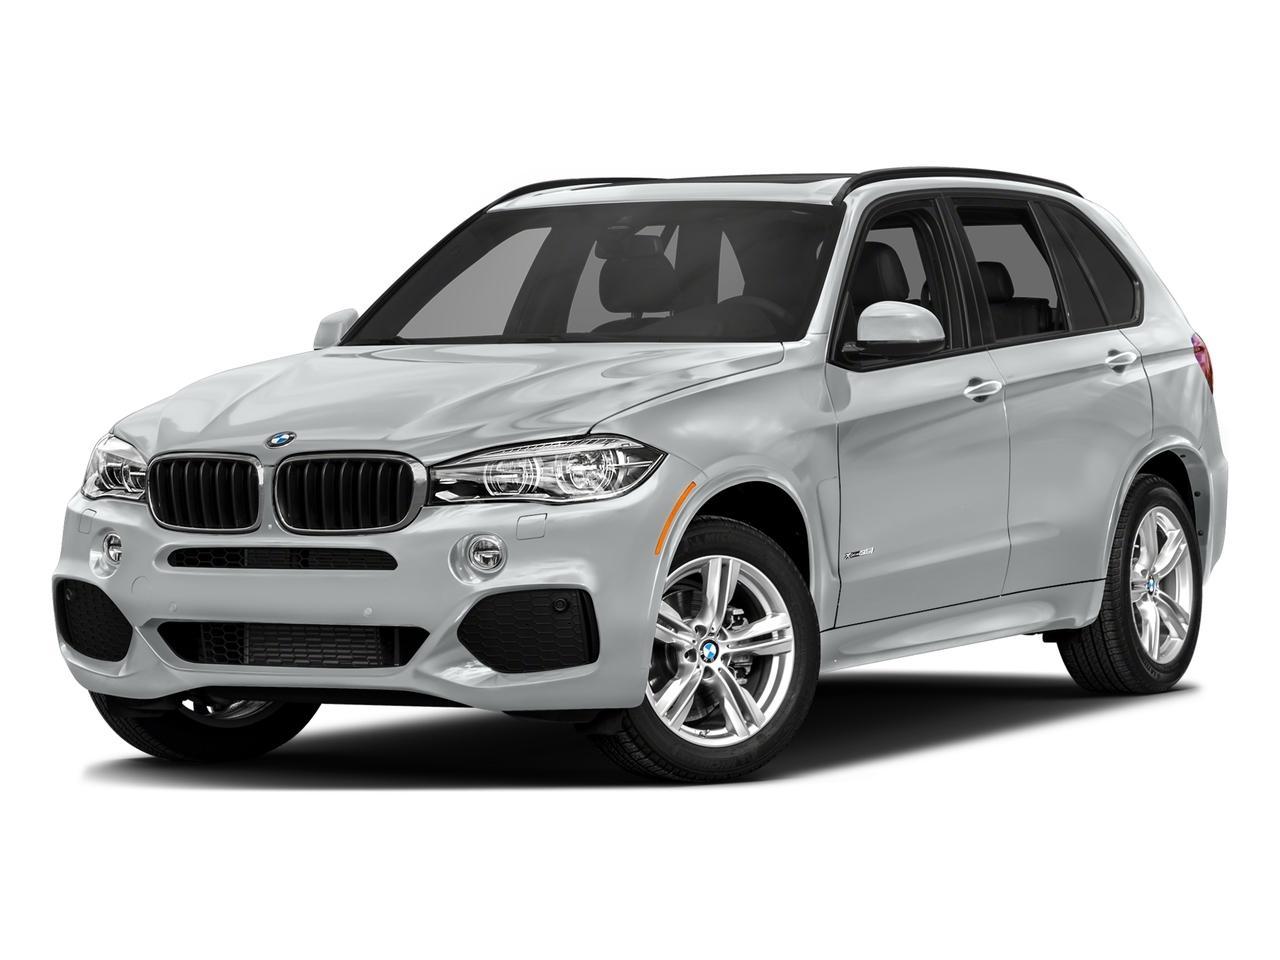 2017 BMW X5 xDrive50i Vehicle Photo in Charleston, SC 29407